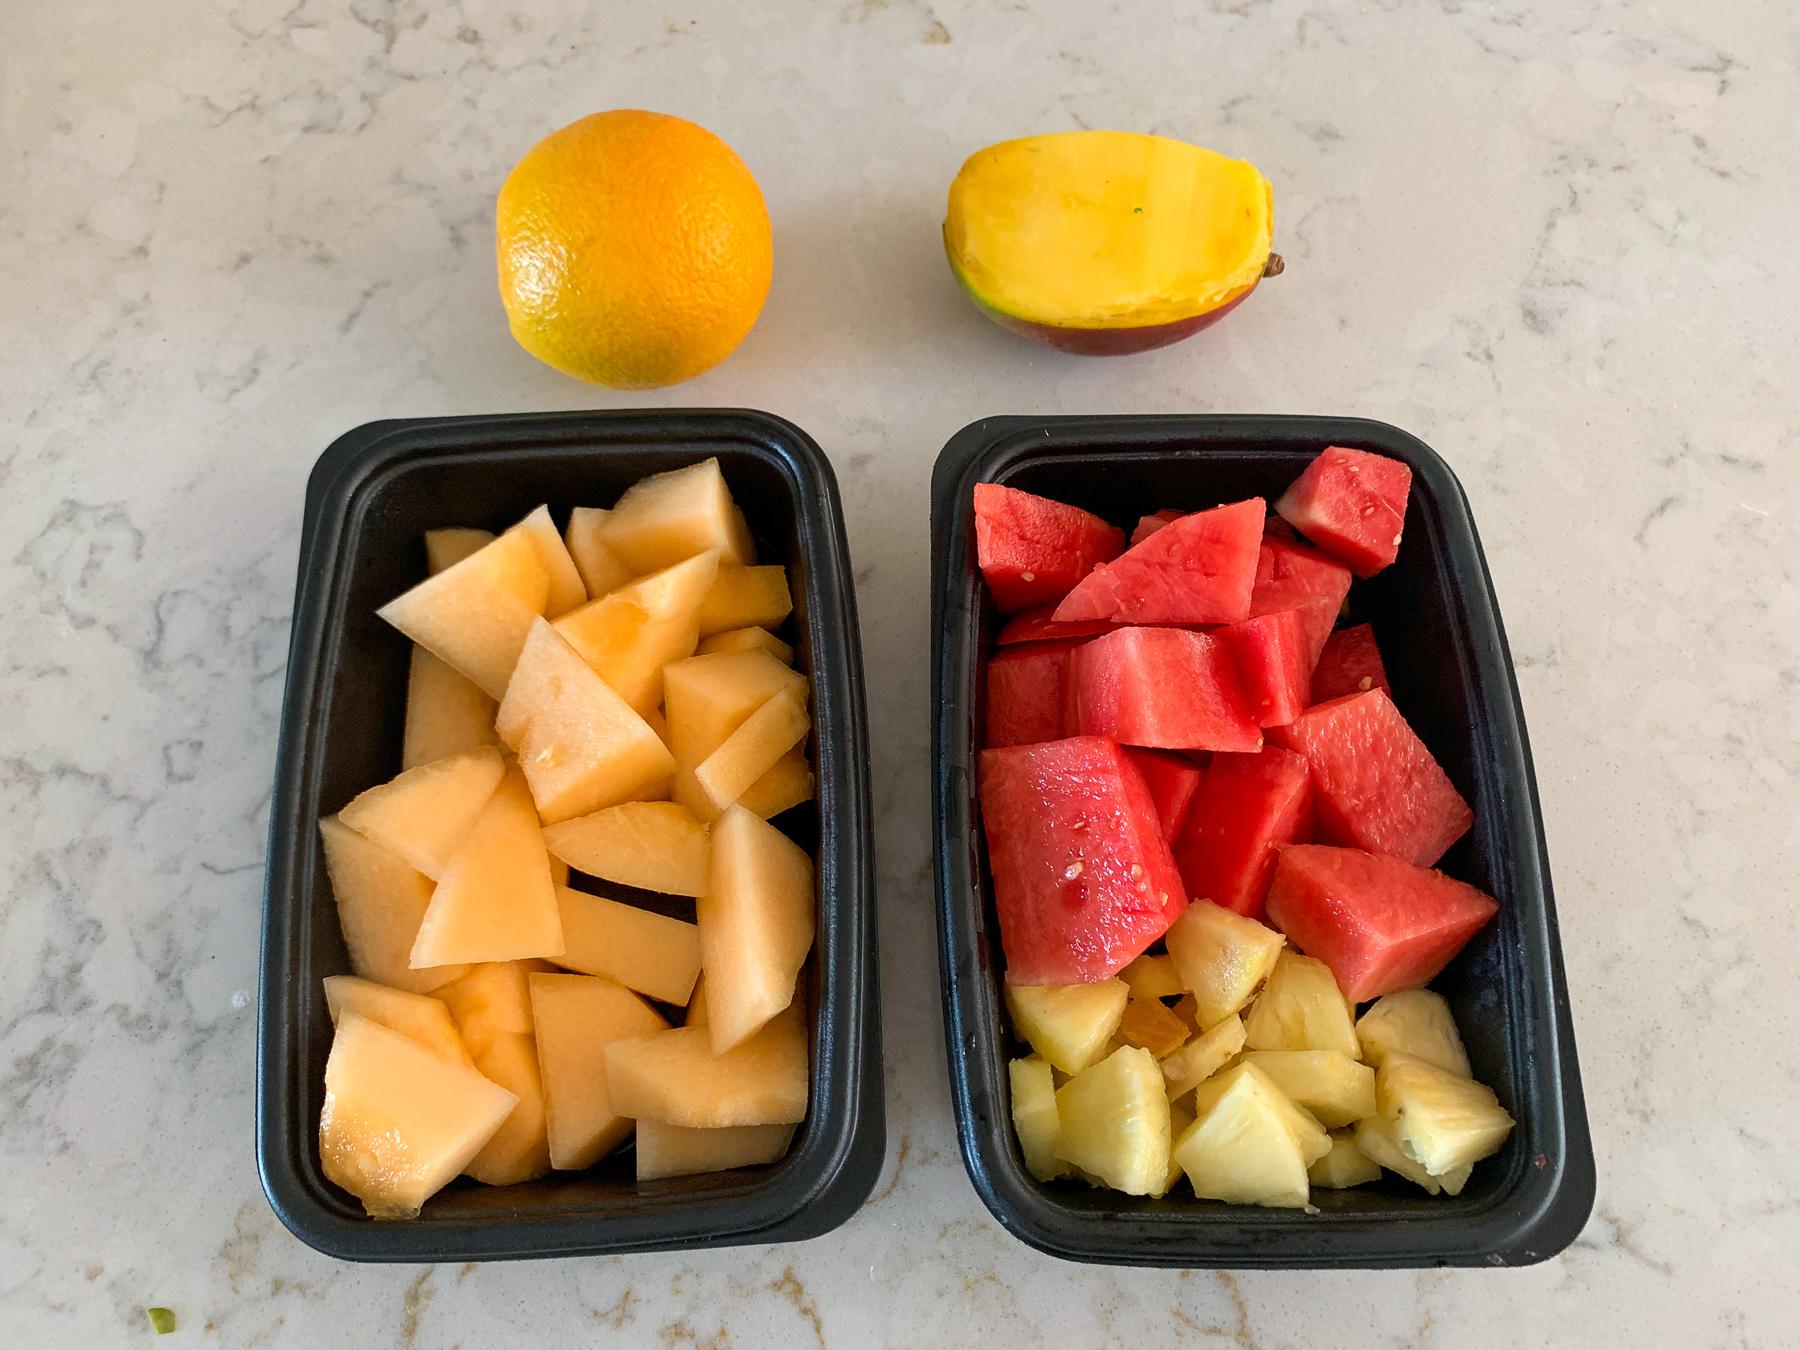 cutupfruit.jpg